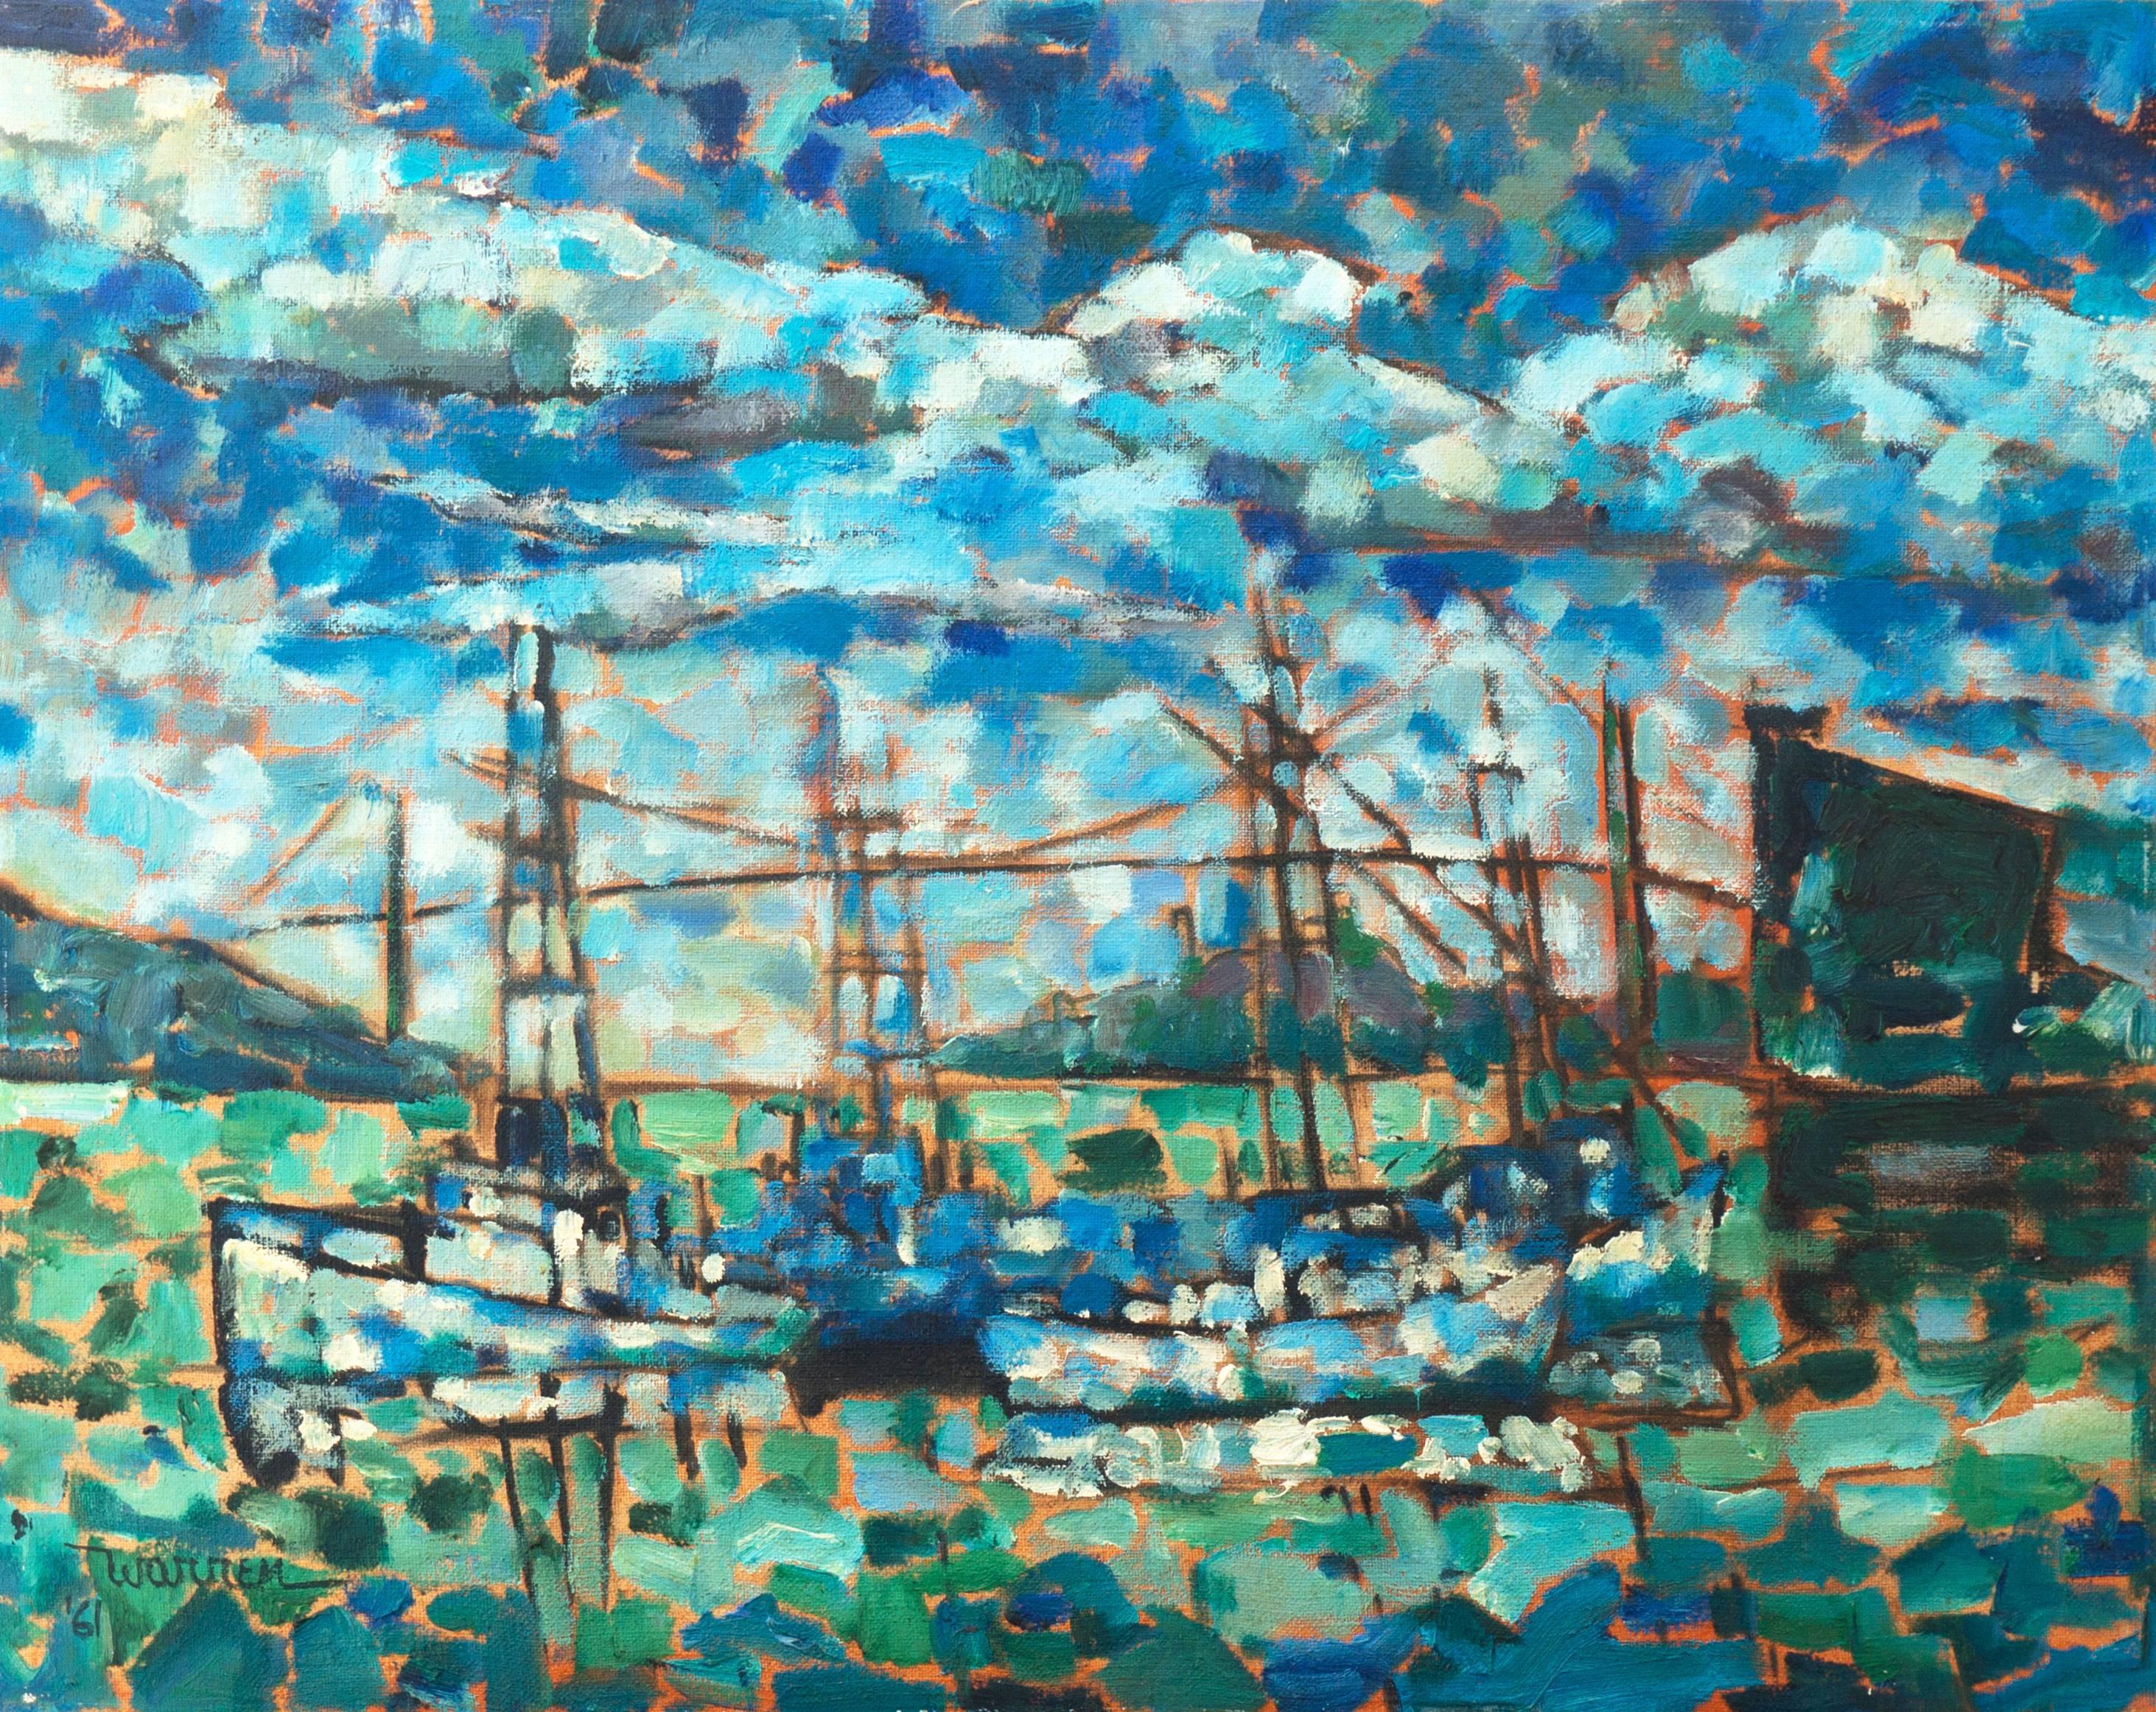 'Fishing Boats beneath the Golden Gate', FRSA, California Post-Impressionist oil